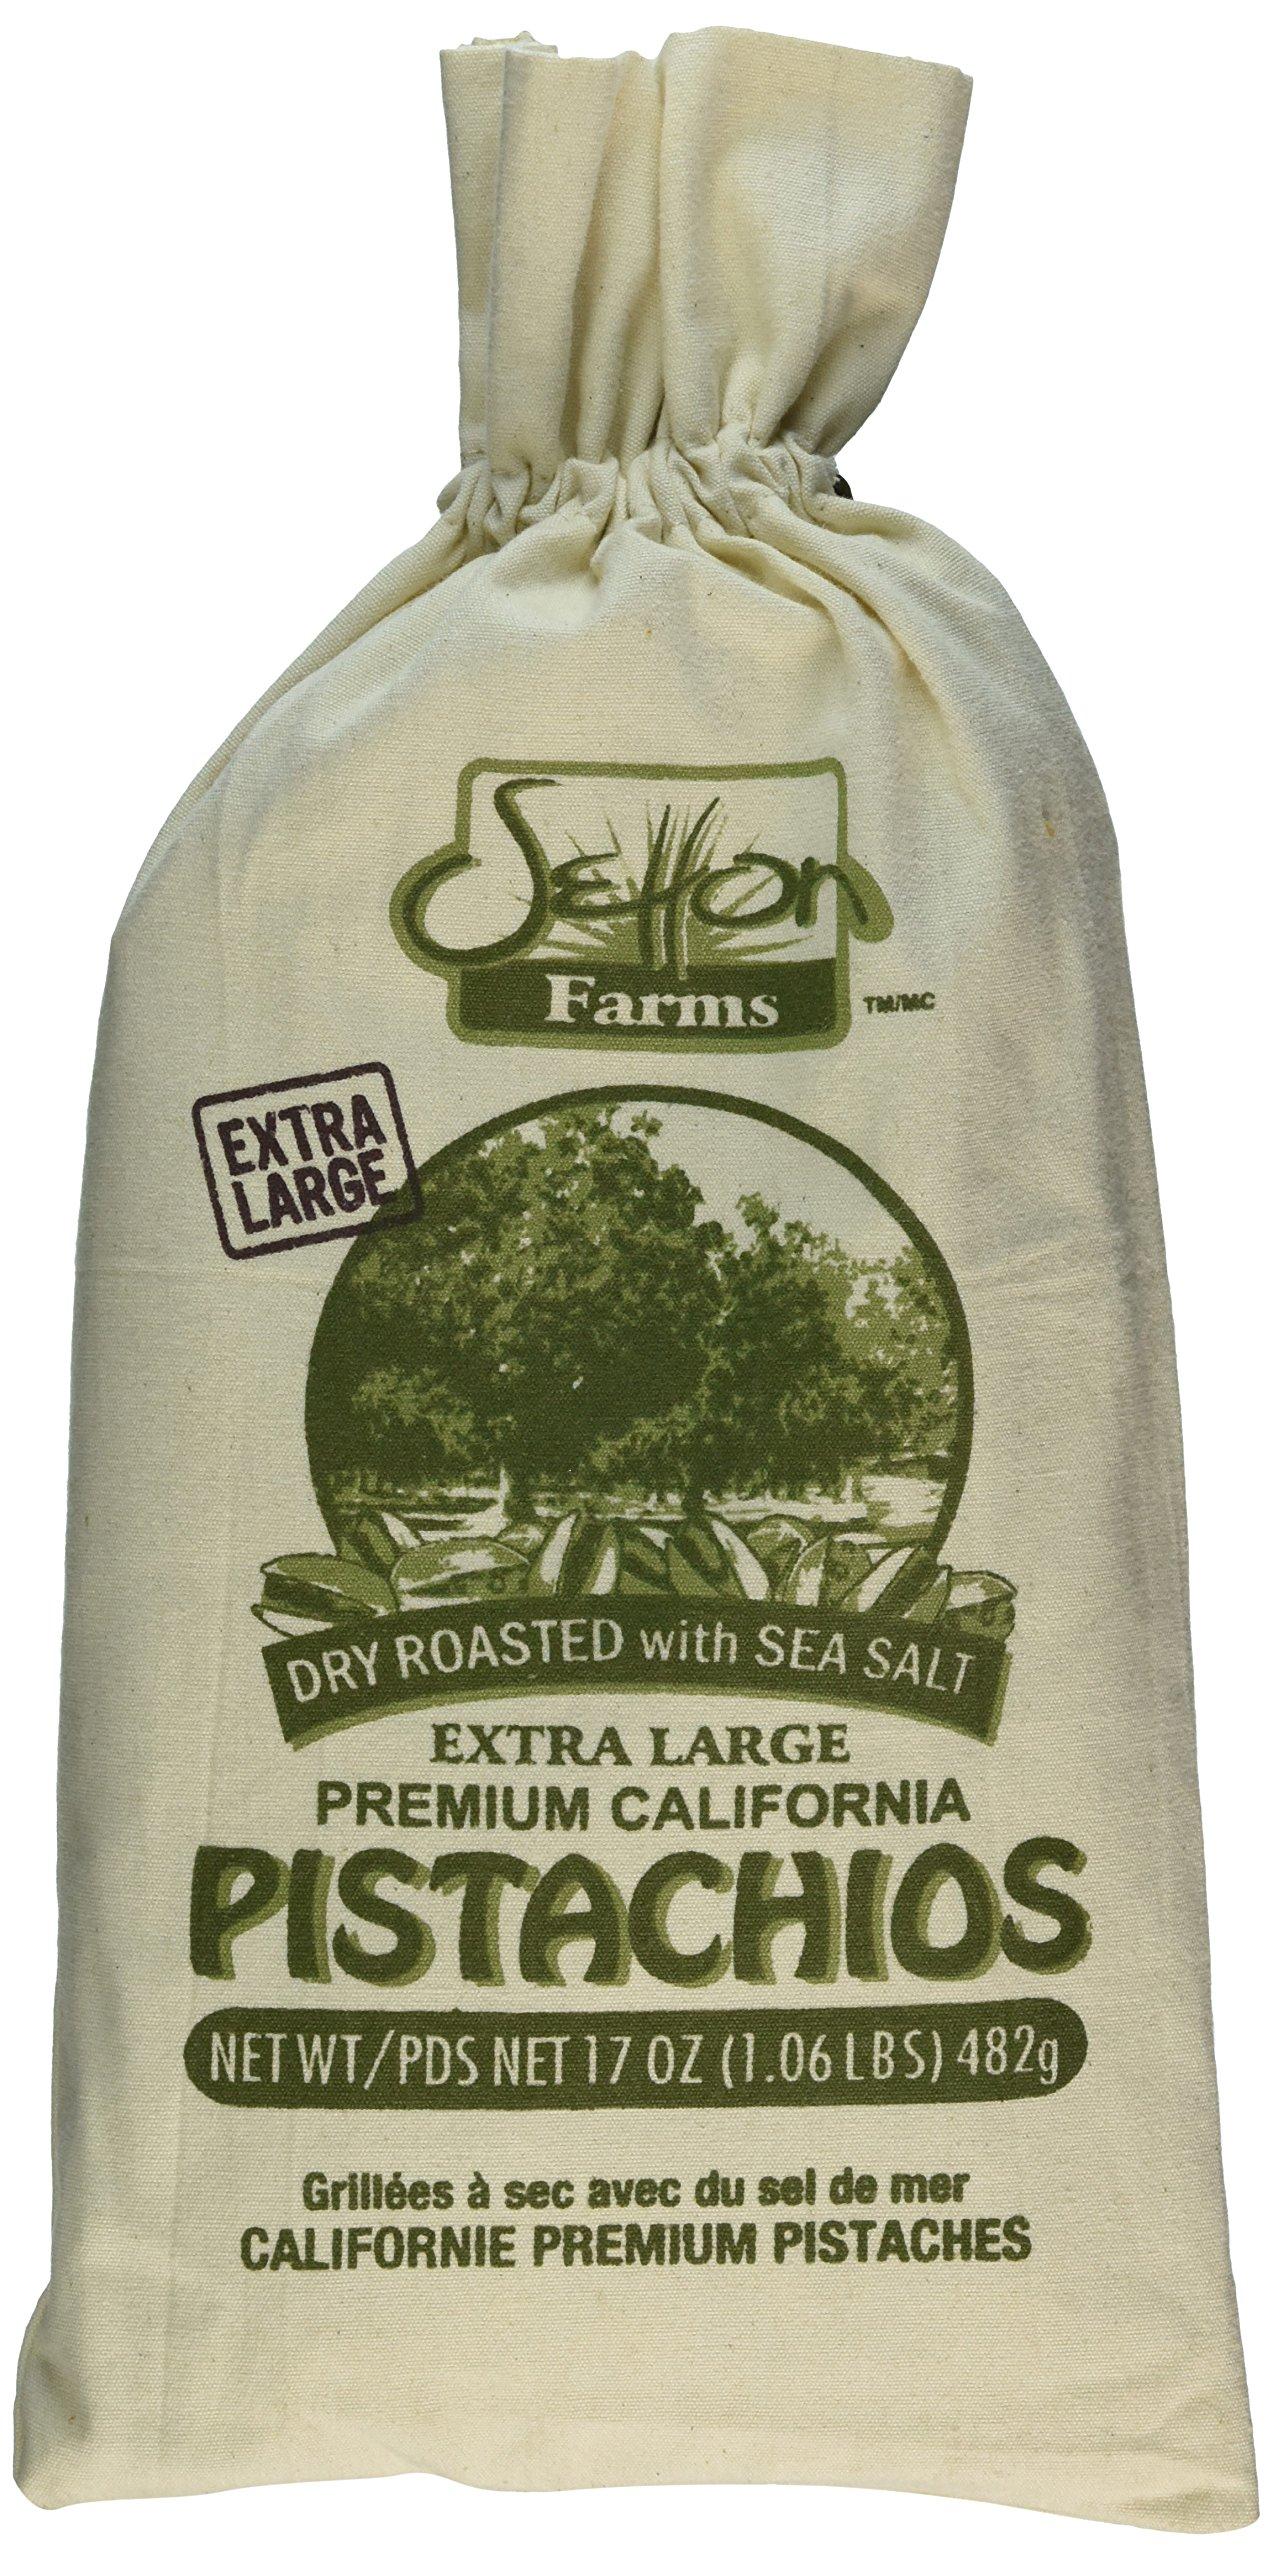 Setton Farms 1.06 LBs Extra Large Pistachios Burlap Bag